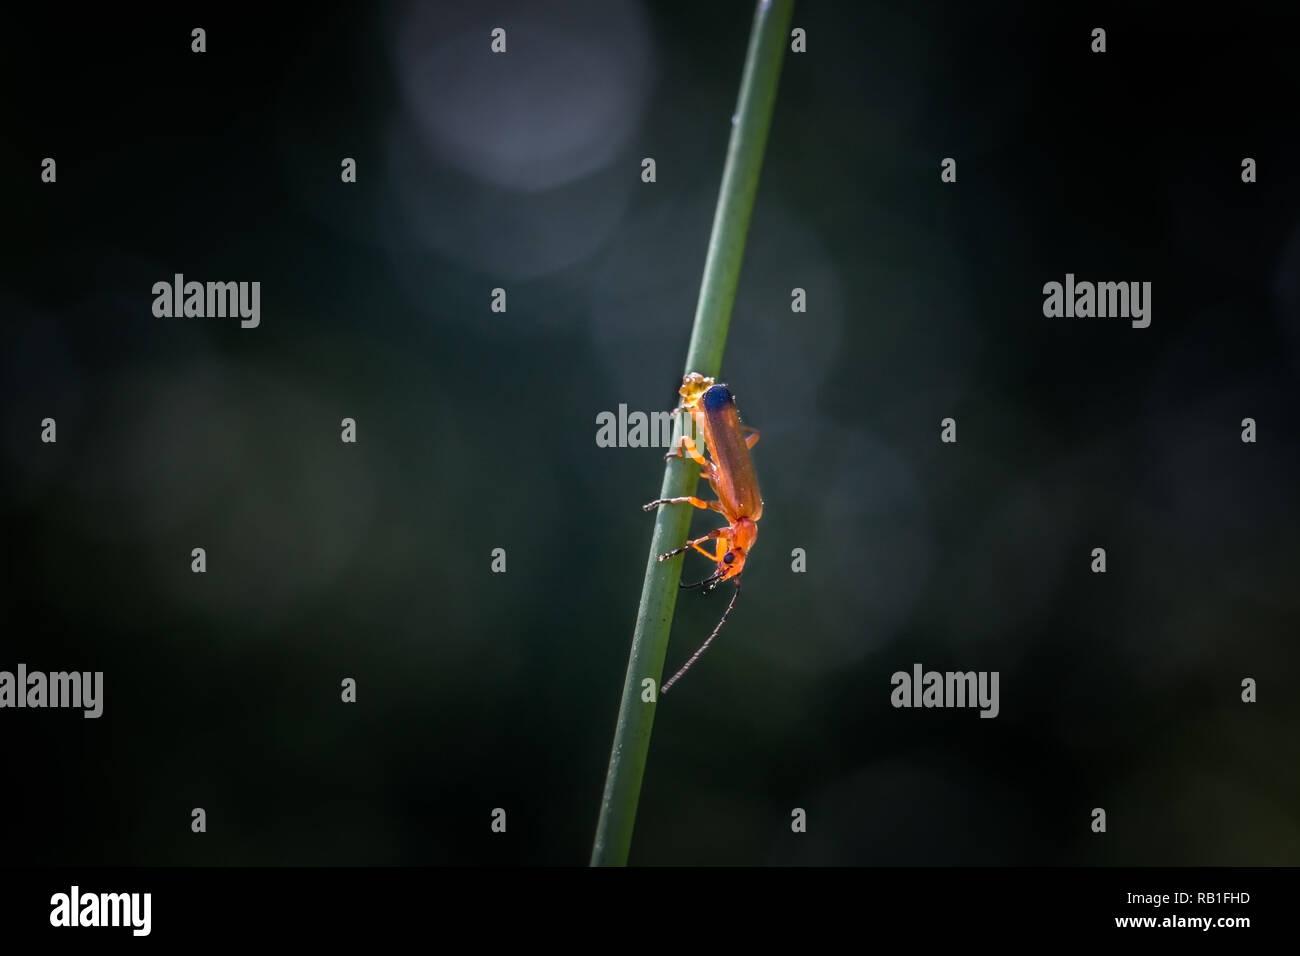 Soldatin Käfer Eier auf einem Grashalm Stockbild